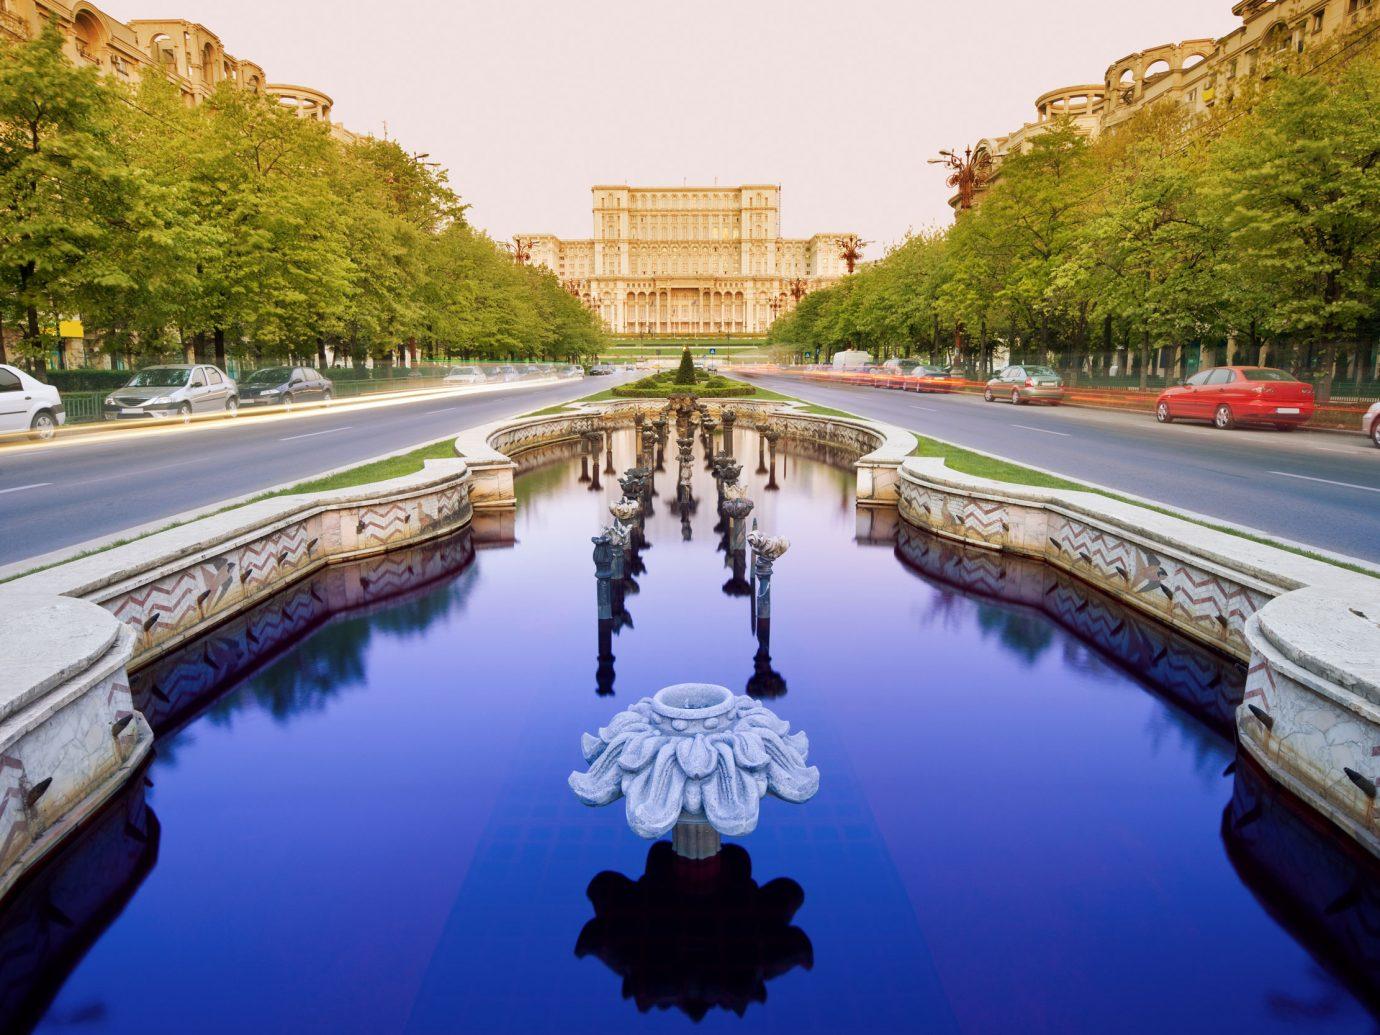 Parliament building in Bucharest, Romania